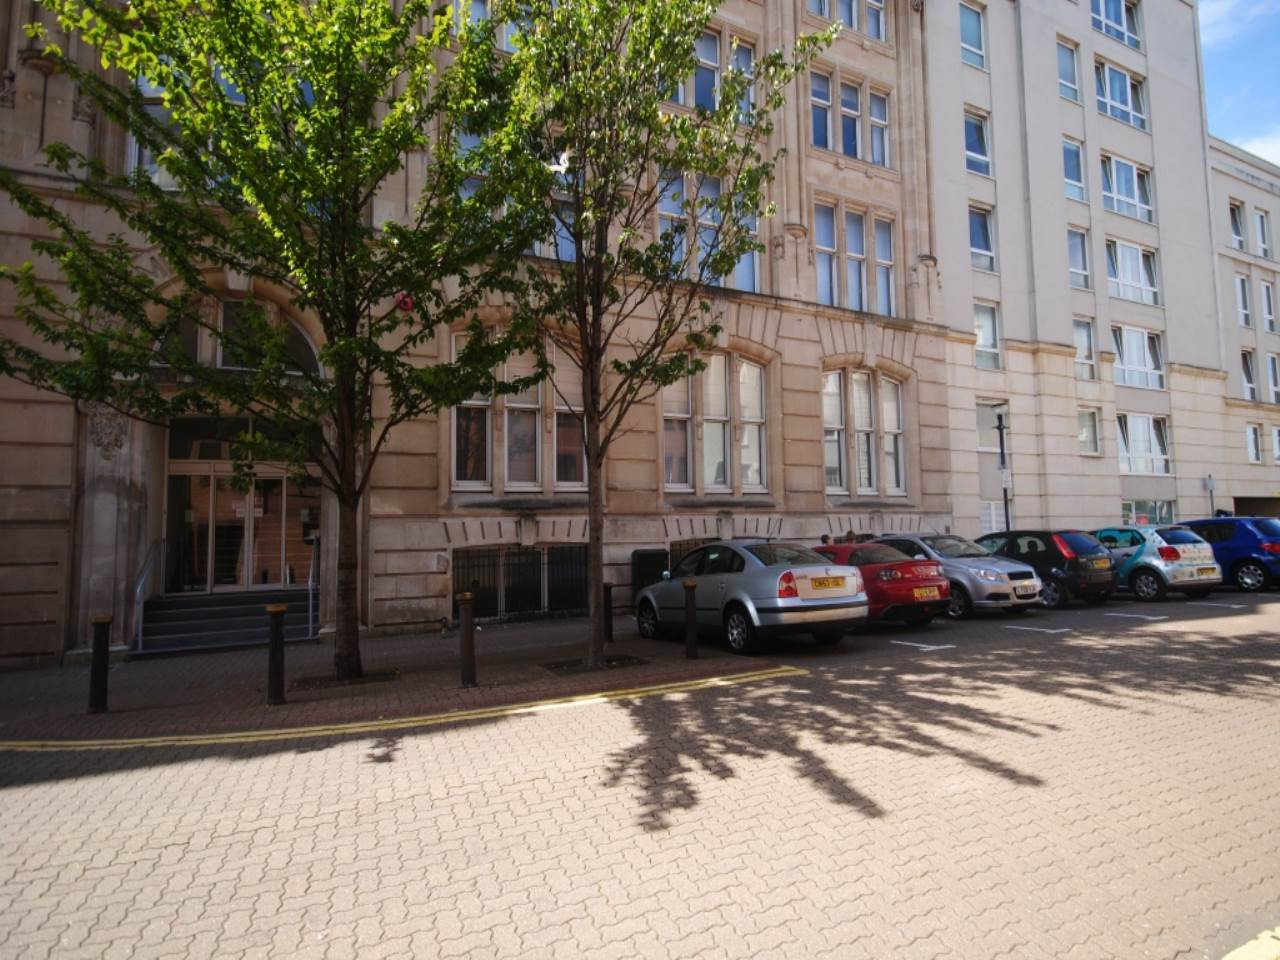 Flat 1 Cymric Buildings, West Bute Street, Cardiff, CF10 5LL